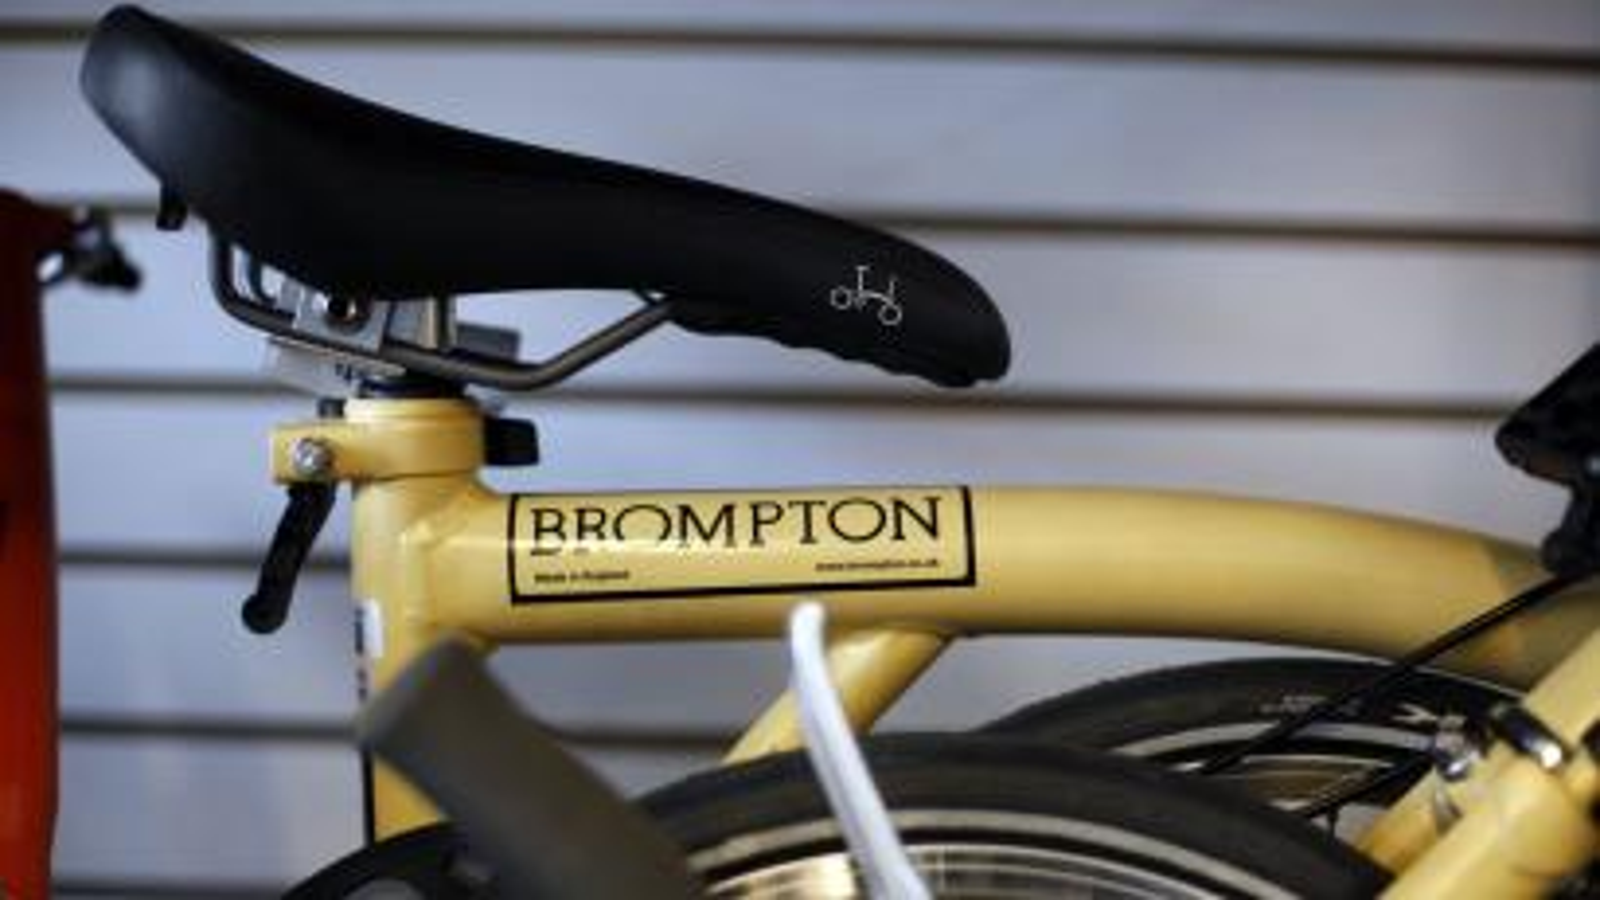 Brompton sadle